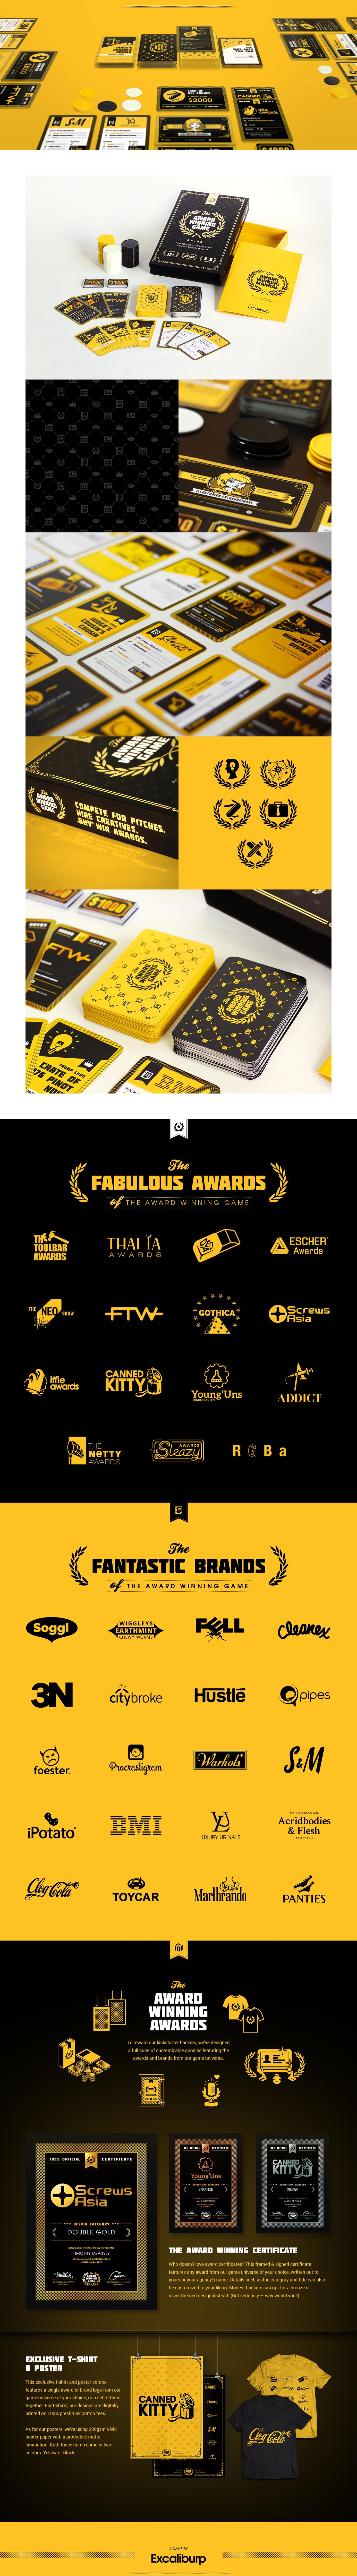 award award winning game Parody Cannes D&AD Young Guns game Advertising Award festival prestige tabletop game cards Kickstarter gold black